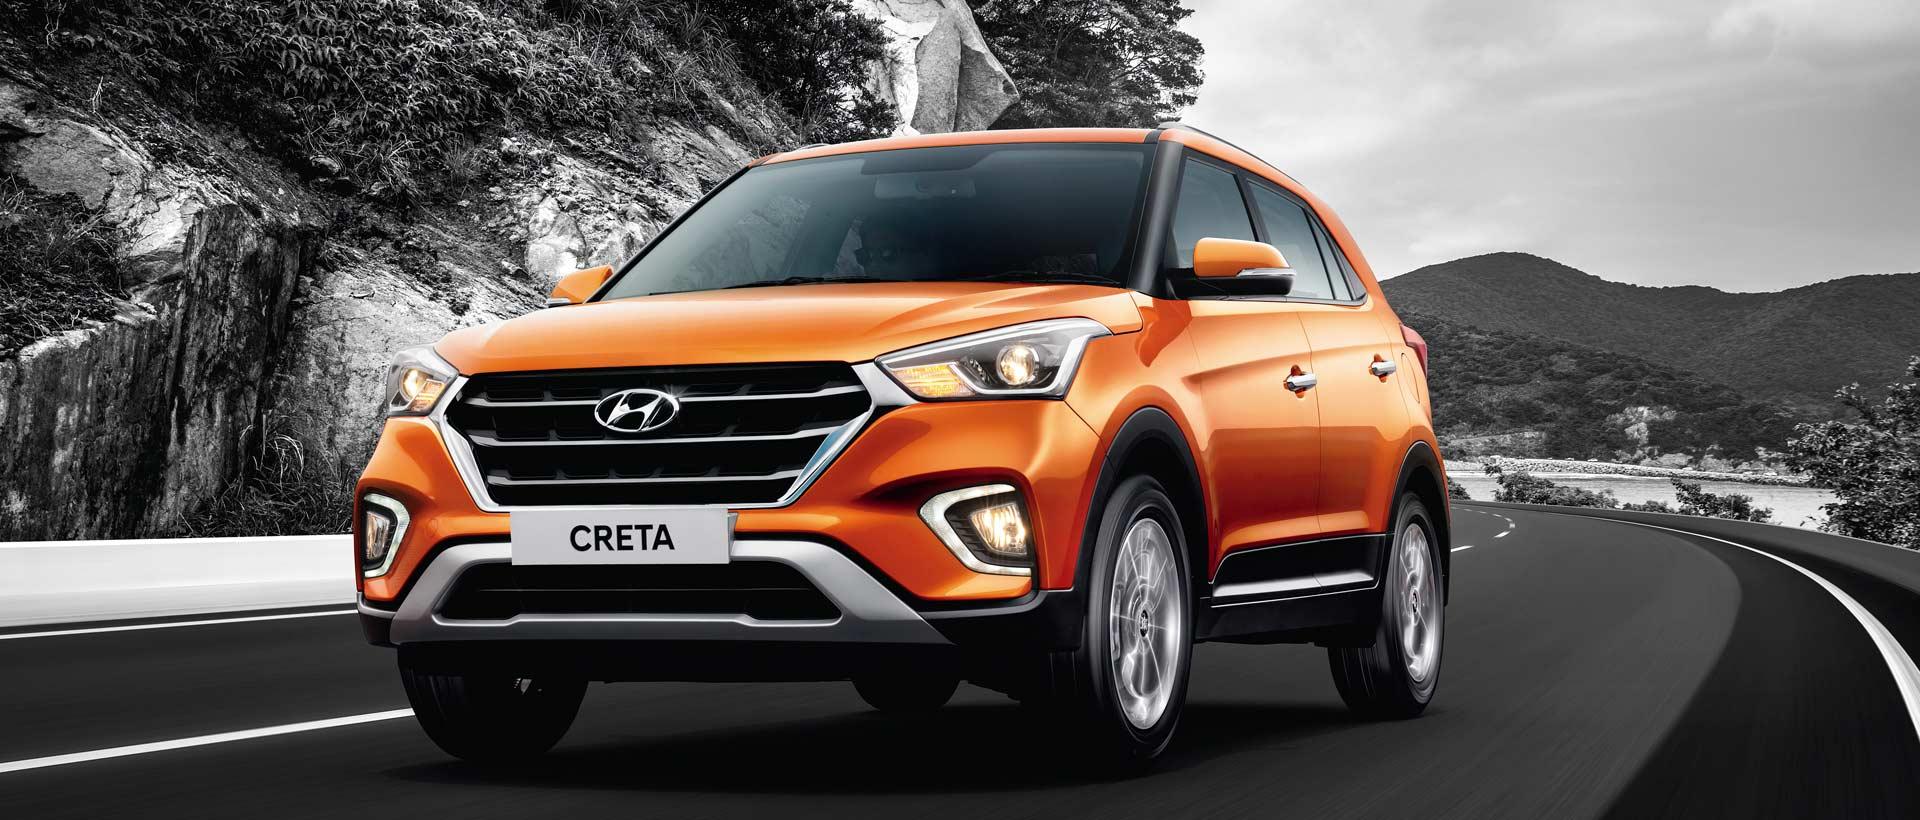 2018-Hyundai-Creta-facelift_4